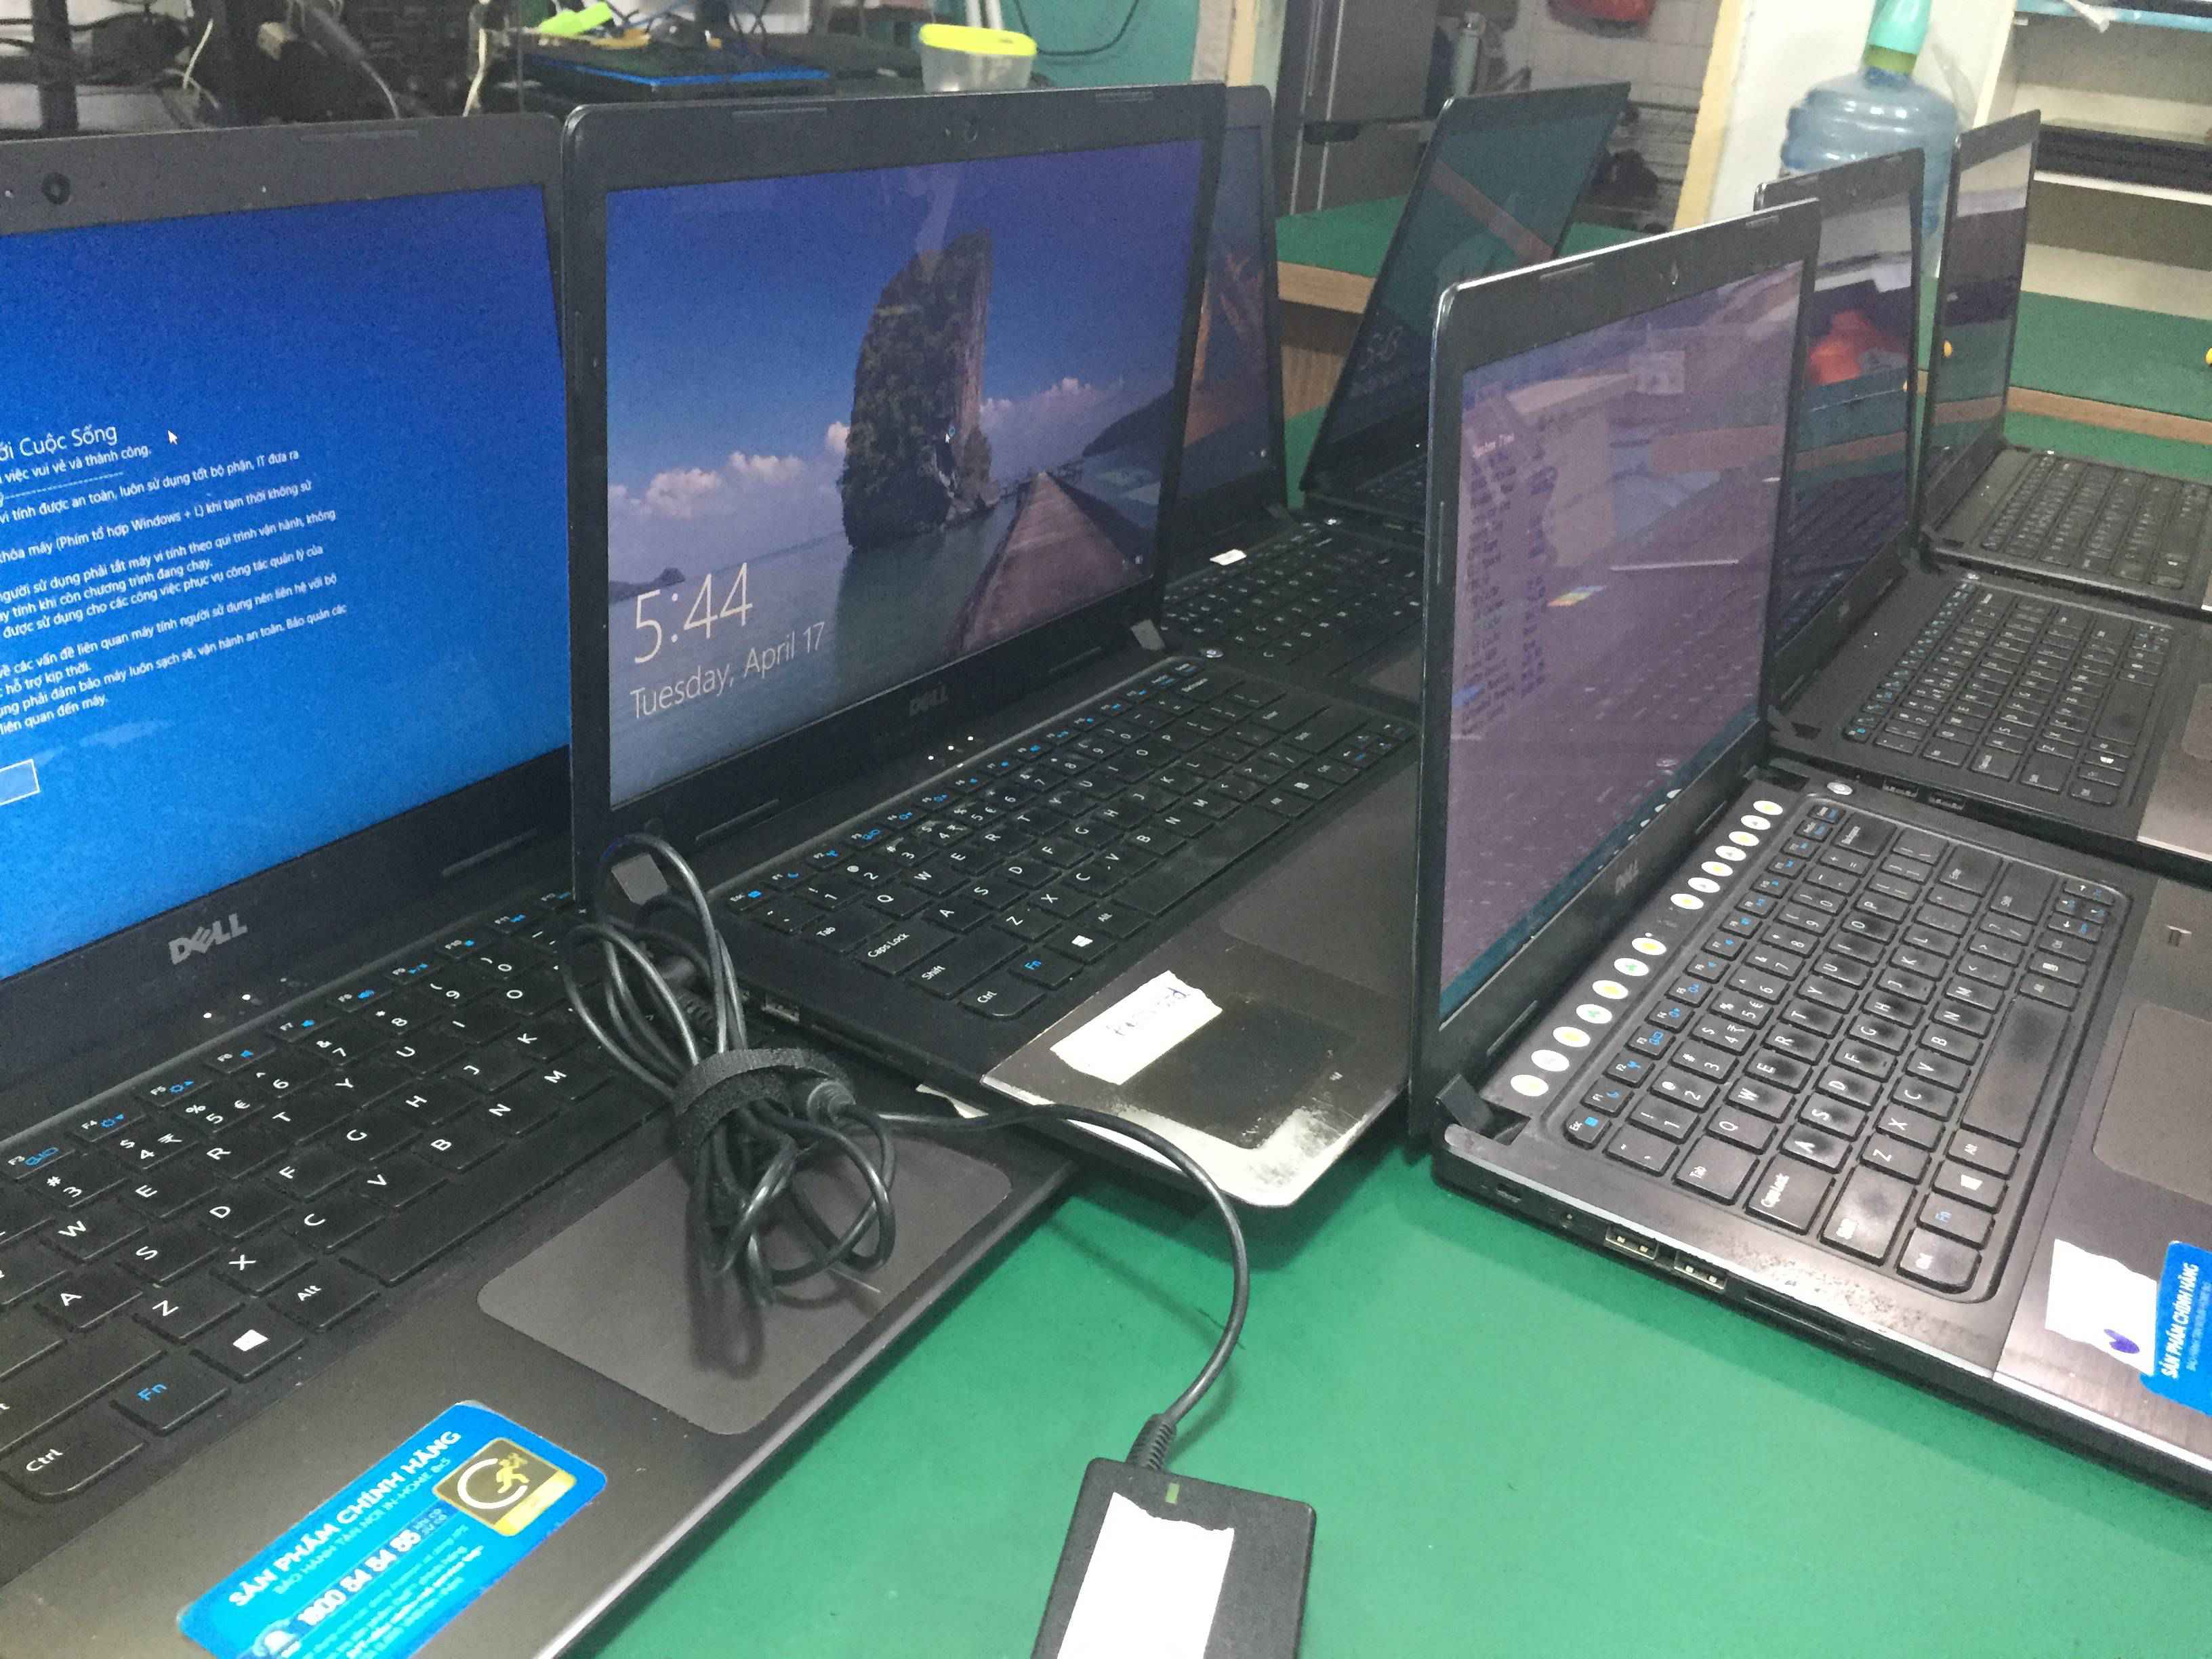 Sửa Bản Lề và Thay Vỏ Laptop DELL Vostro 5470